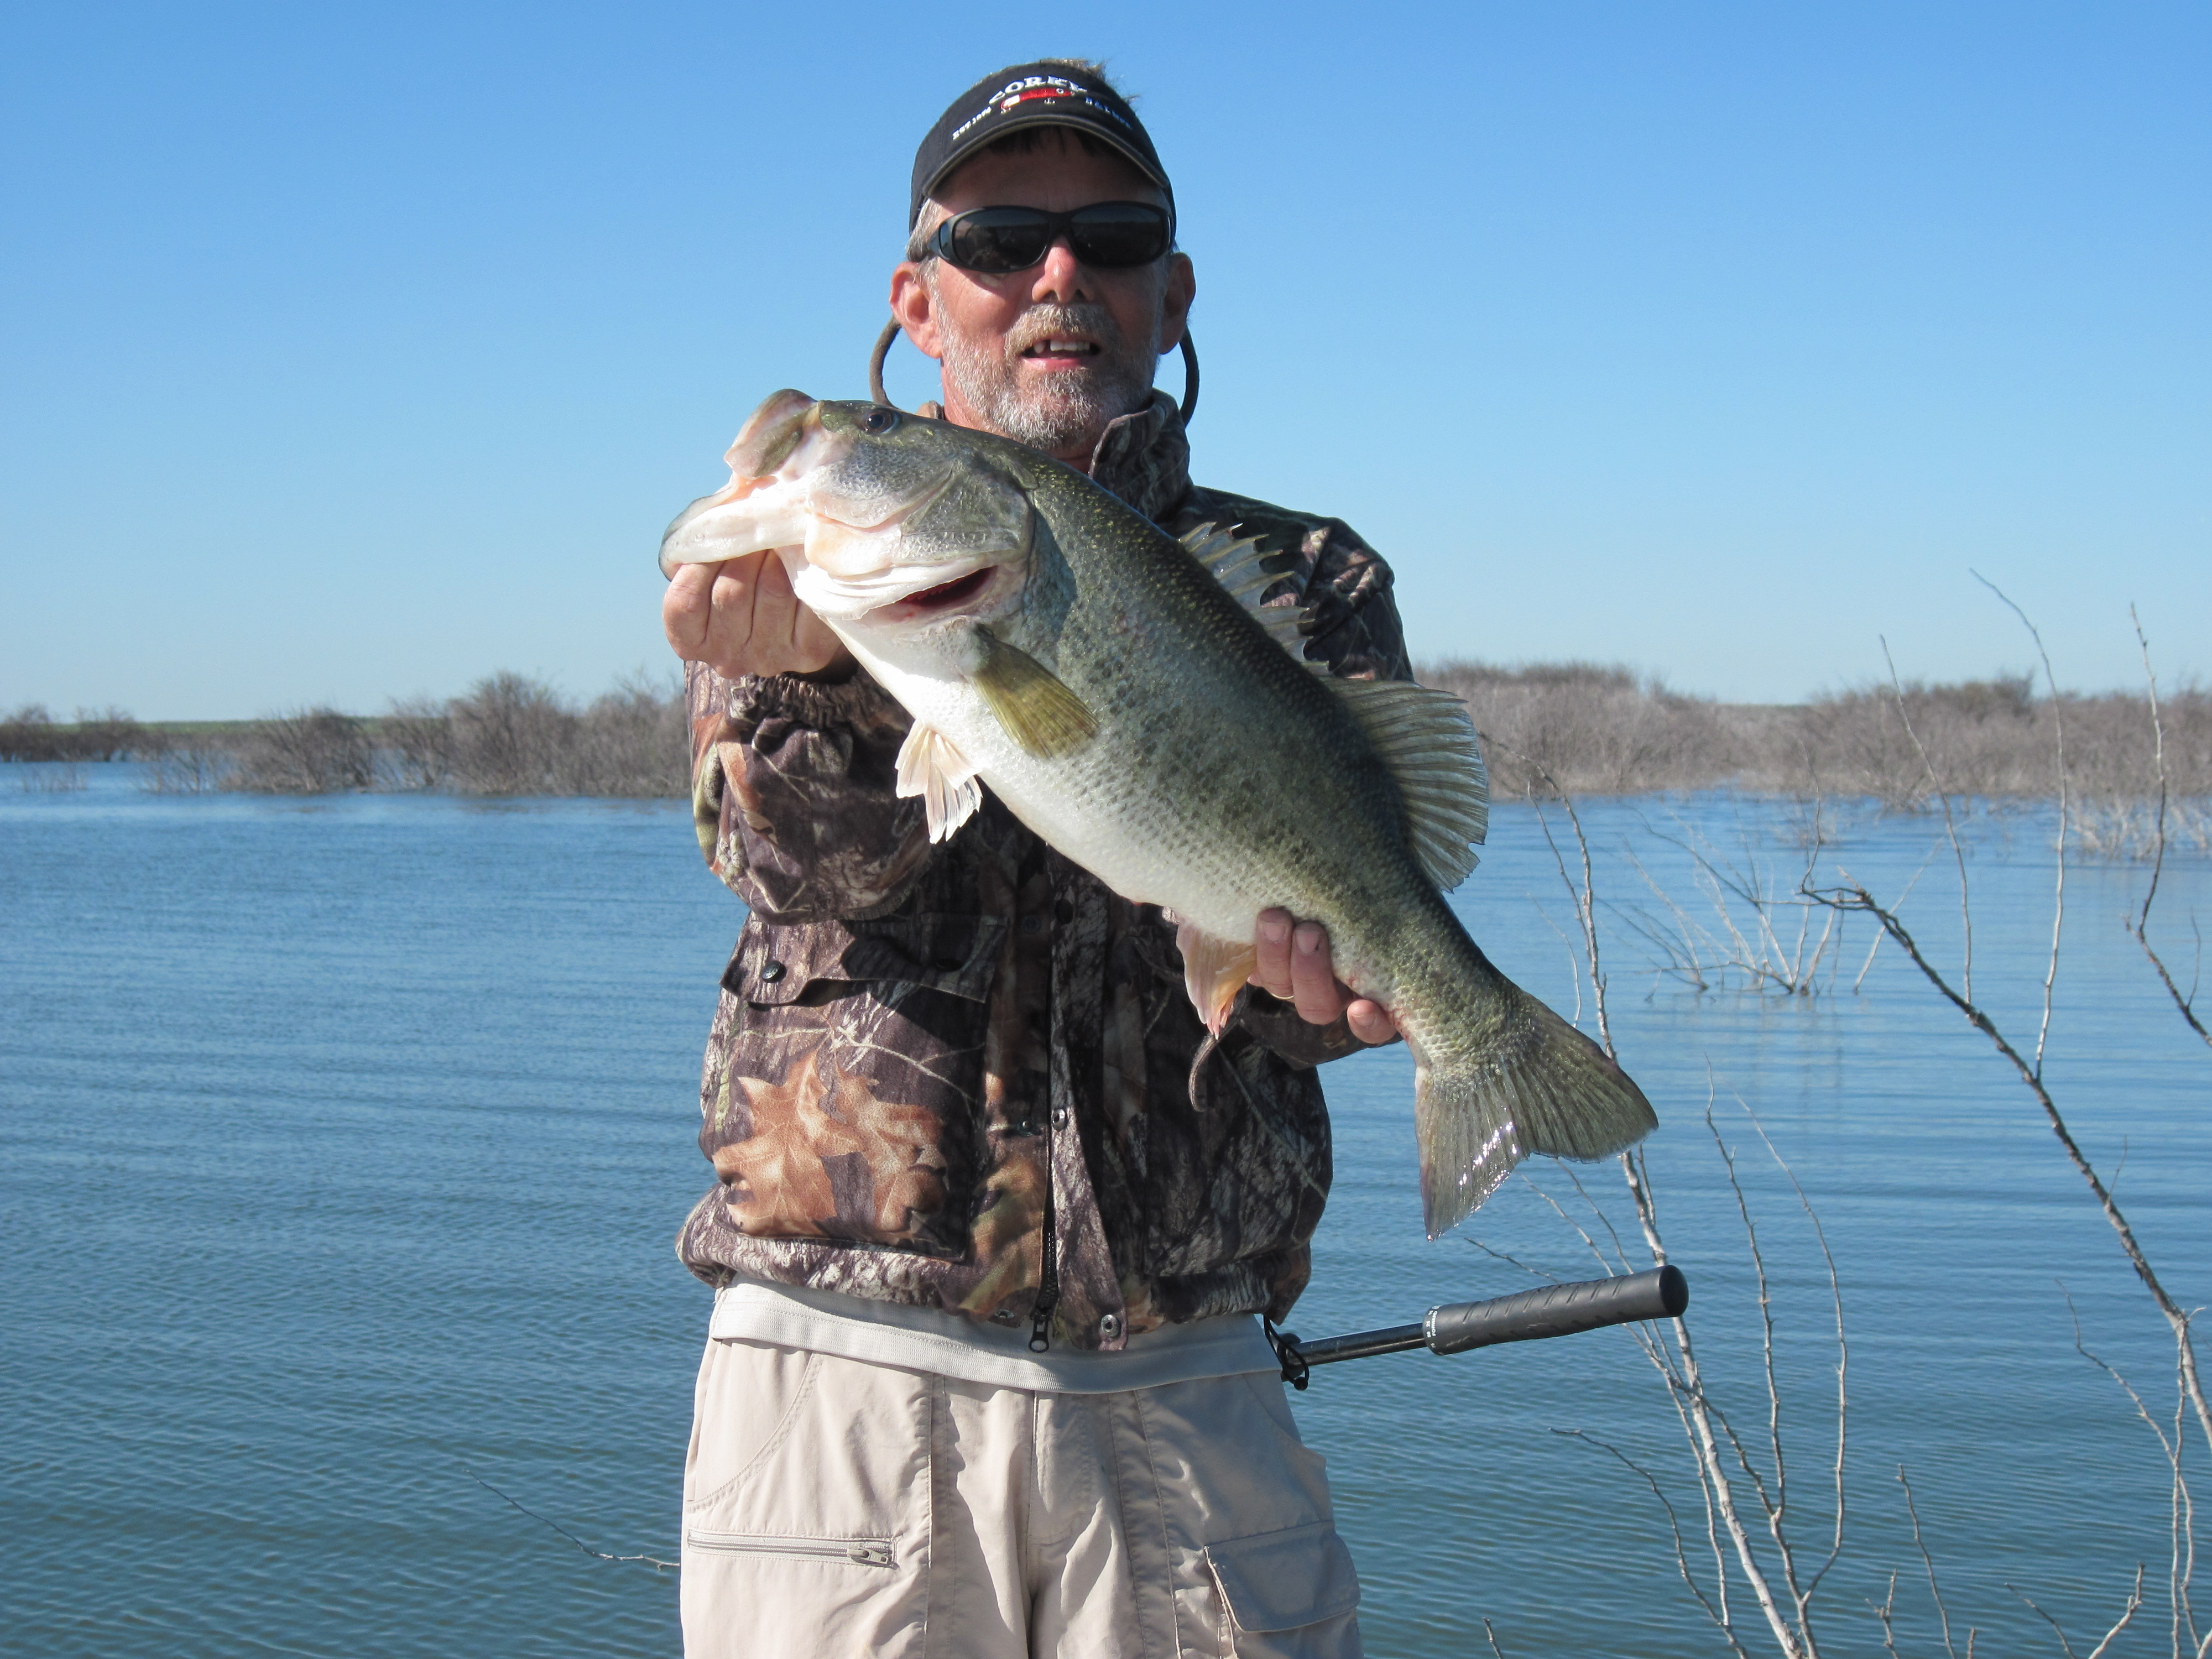 Falcon lake texas where dreams are made fish catching for Falcon lake fishing